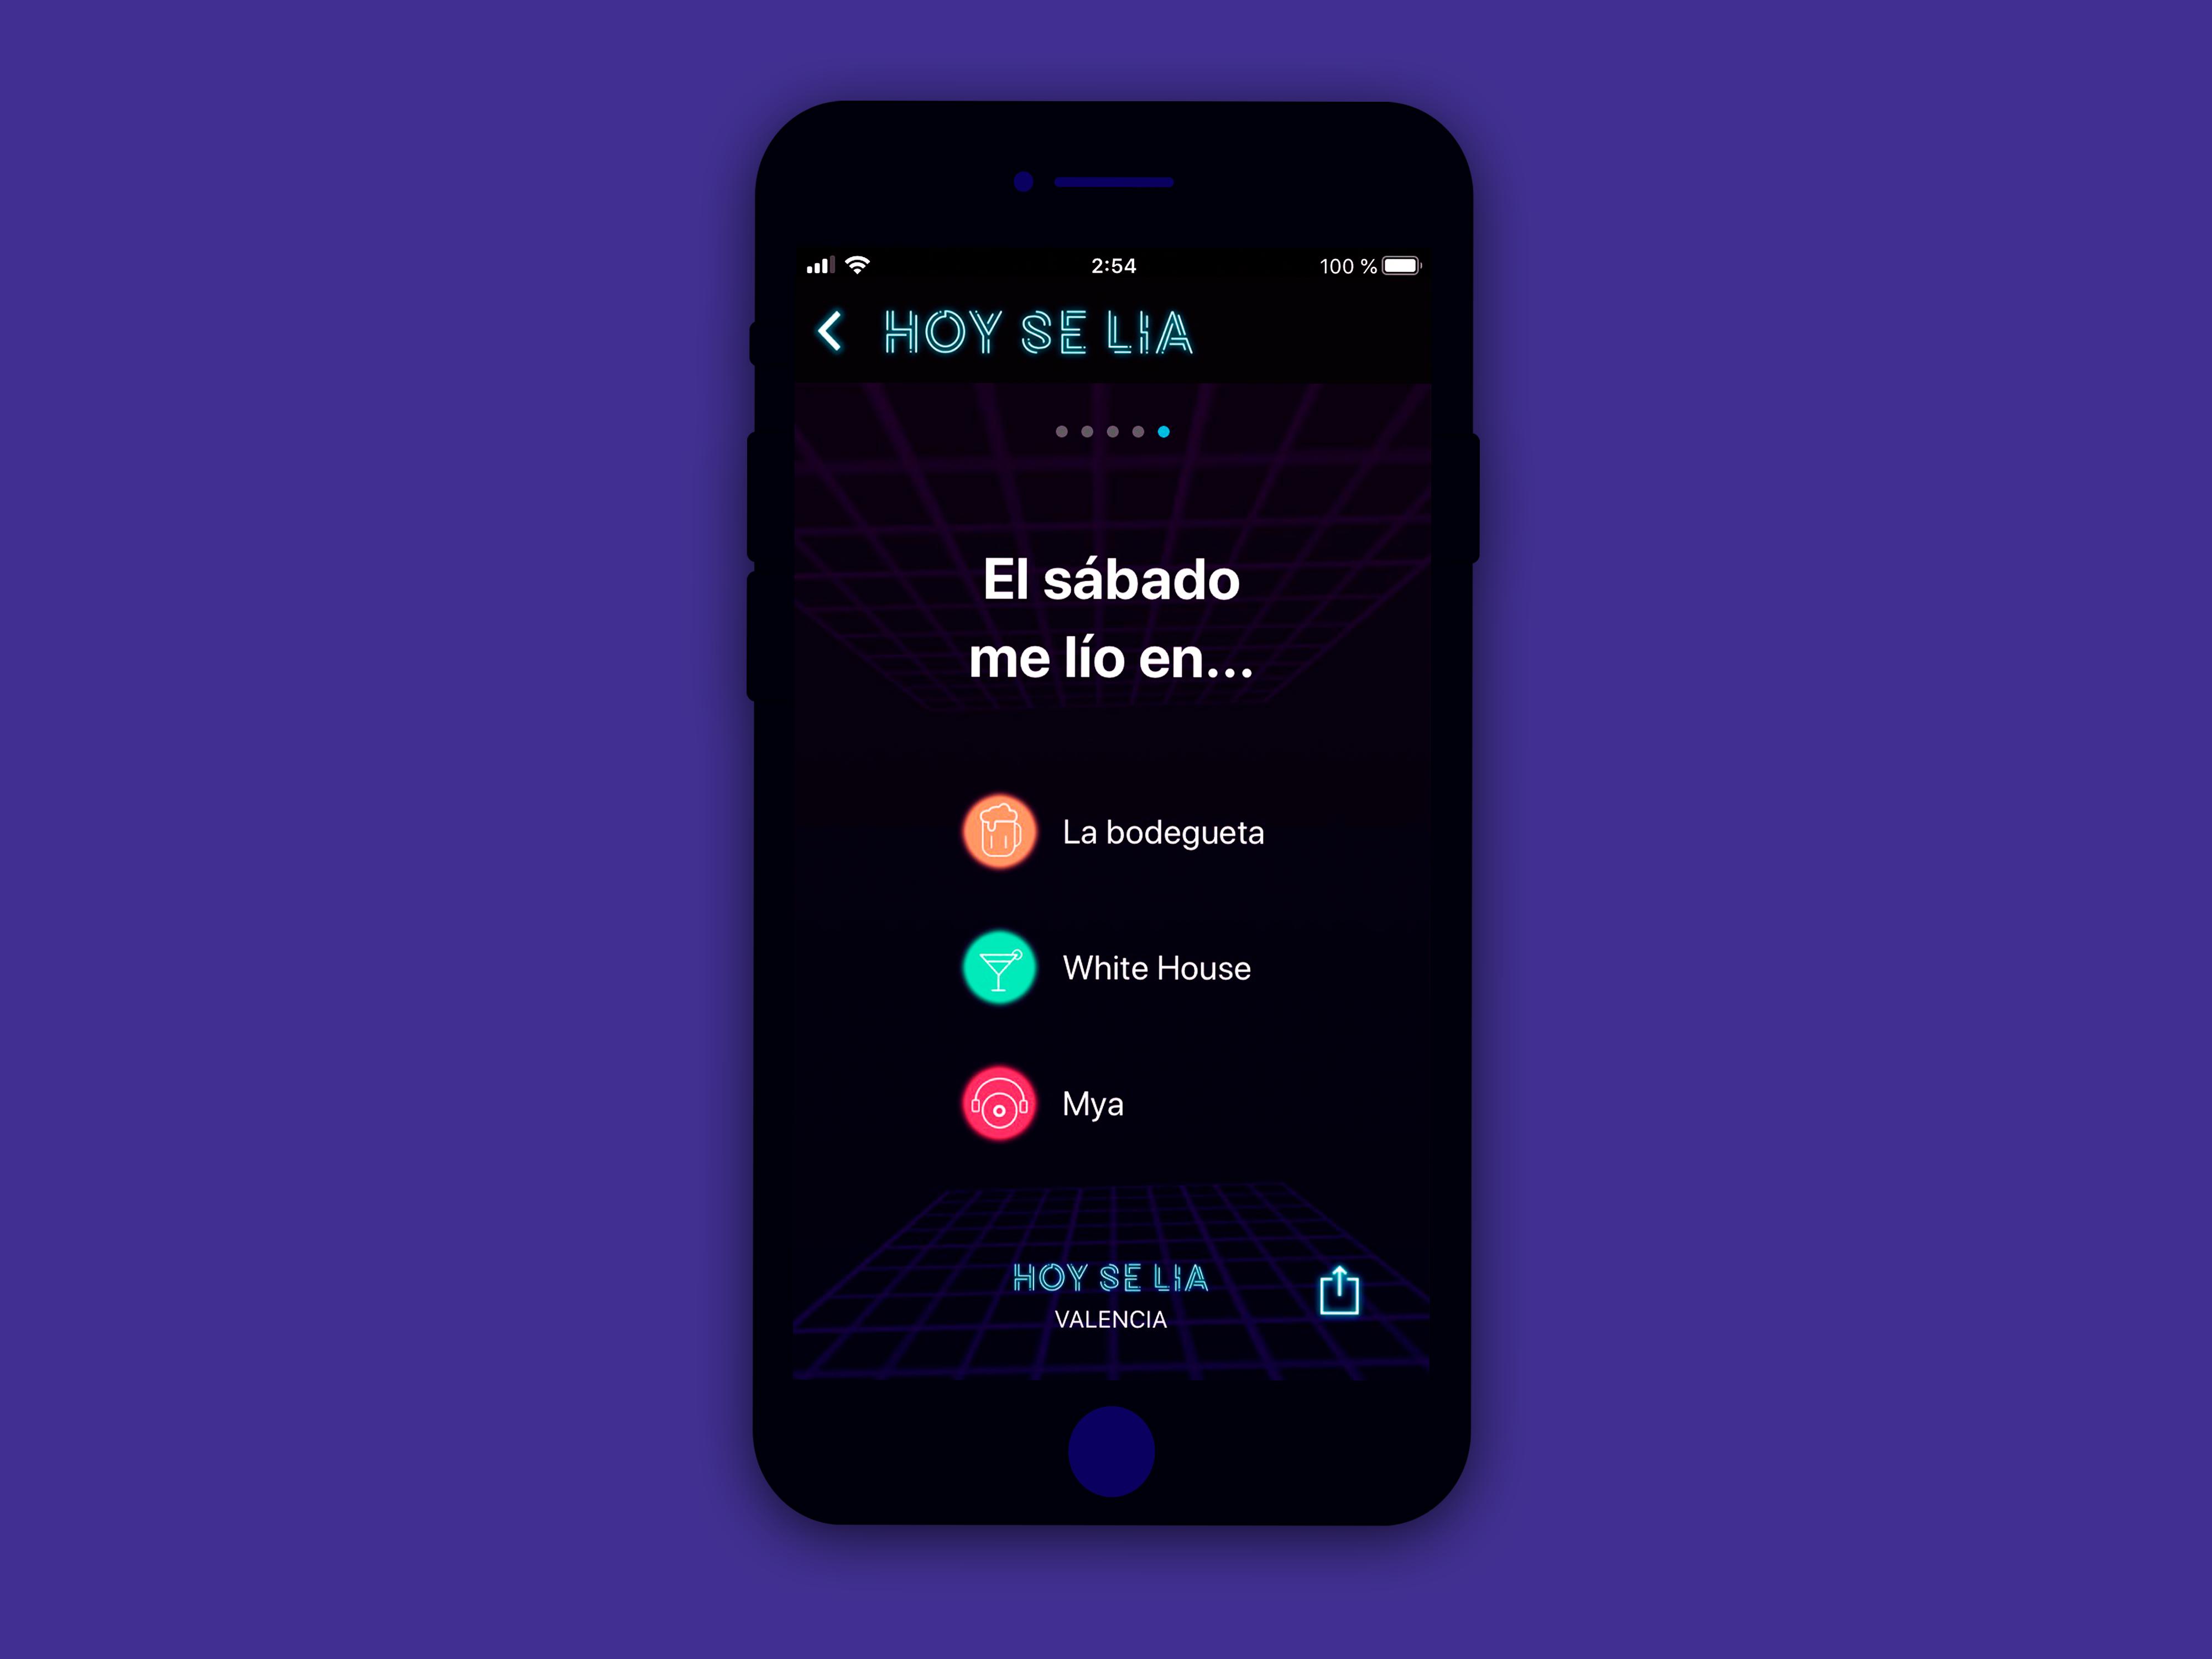 2.HOY SE LÍA